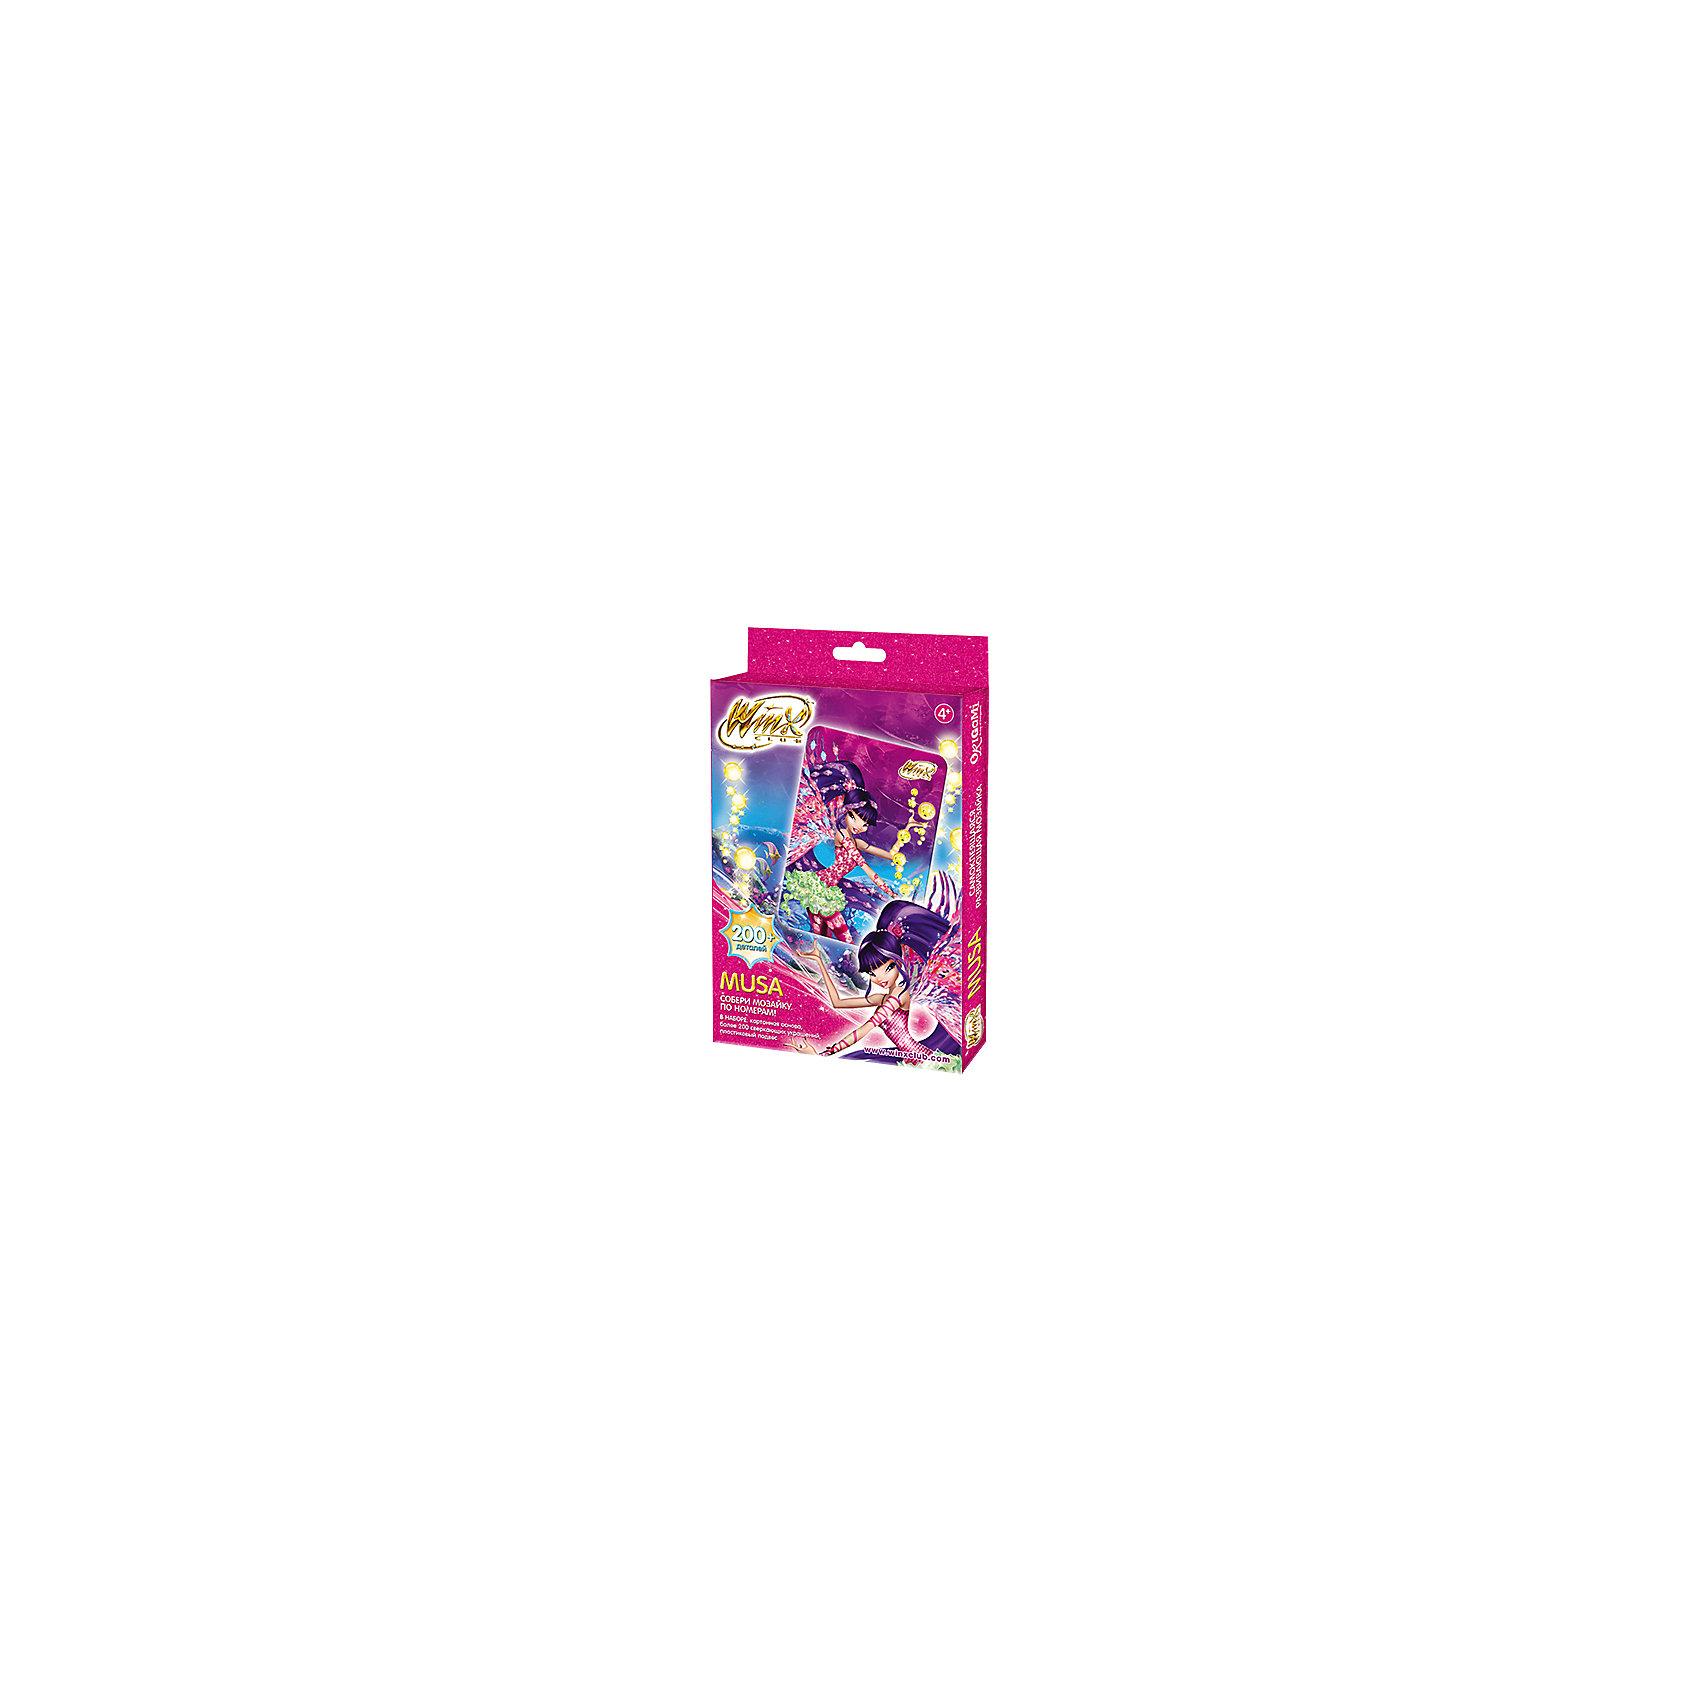 Origami Самоклеющаяся мозаика Муза, Winx Club набор инструментов irwin 3 предмета